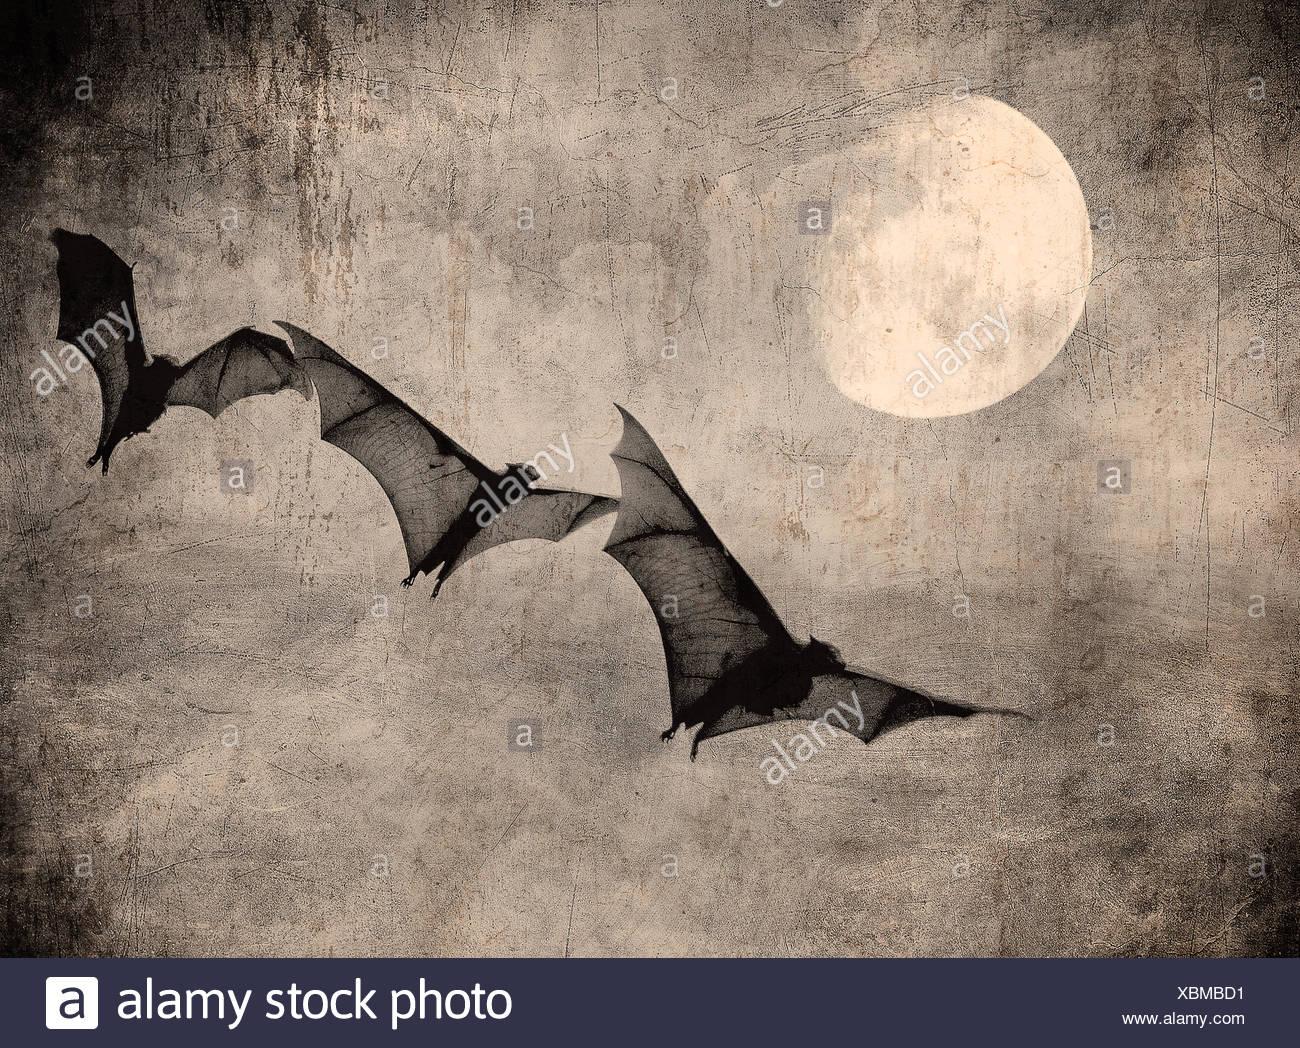 Fledermäuse in den dunklen bewölkten Himmel, perfekte Halloween-Hintergrund Stockbild